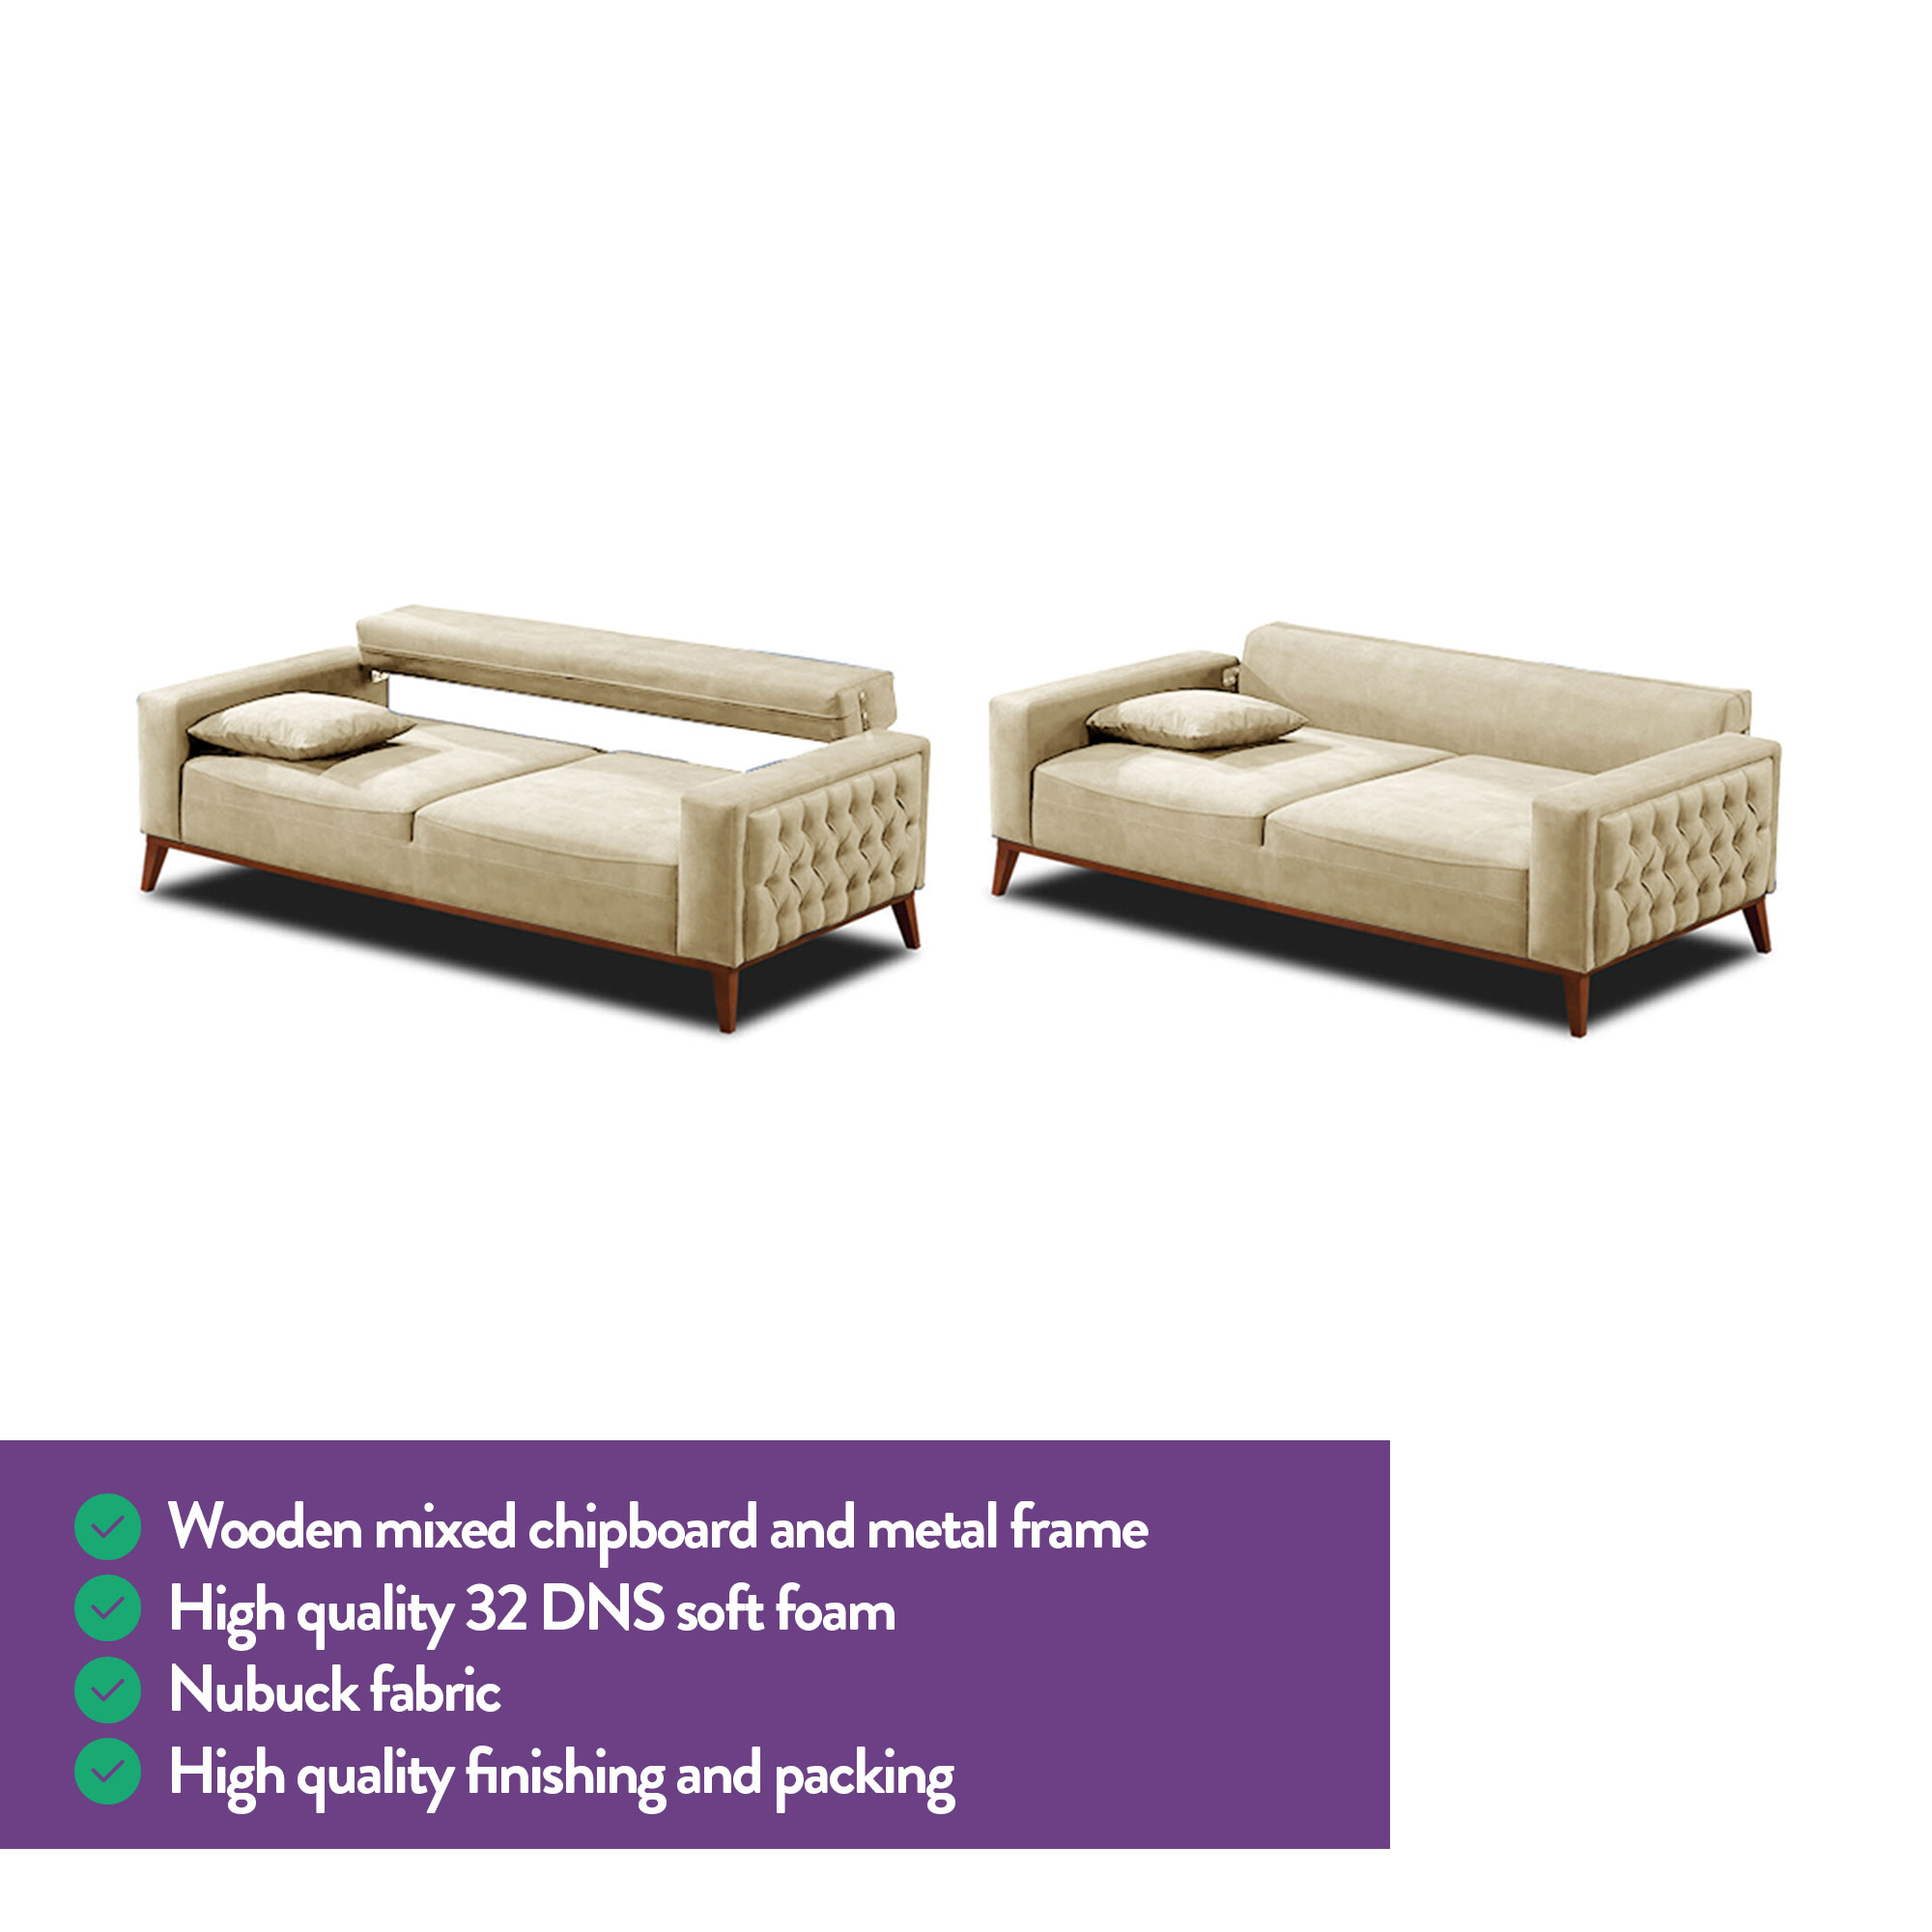 Mare Collection Luna Tufted Arm Modern 2 Seater Loveseat Sofa, Shaker Beige  - Home Designer Goods